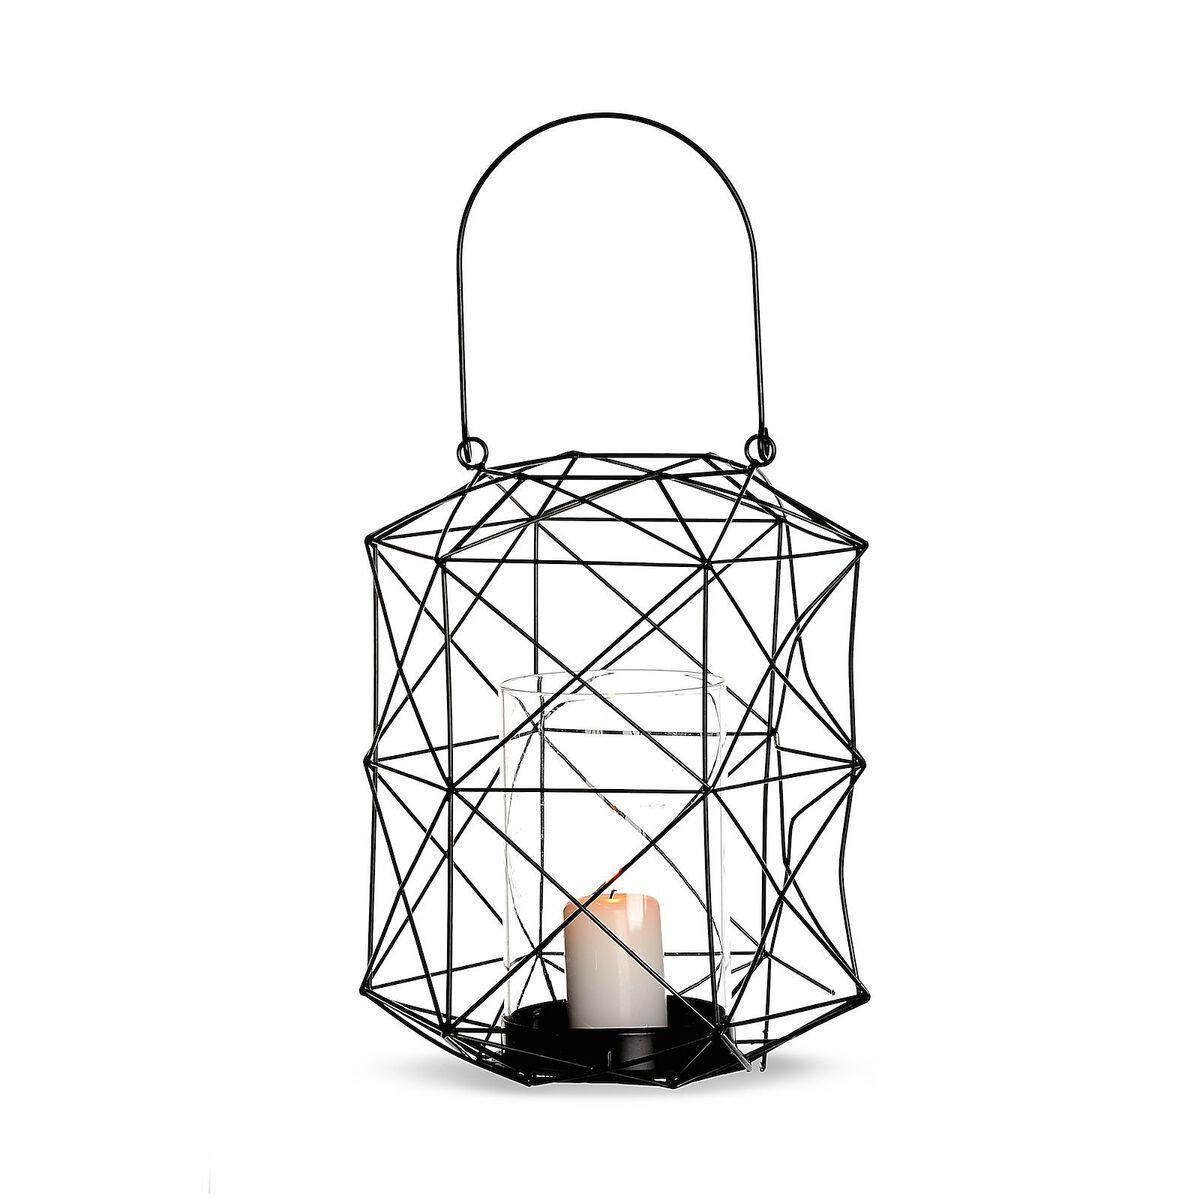 windlicht aus metall ca d 21 x h 25cm schwarz depot de. Black Bedroom Furniture Sets. Home Design Ideas